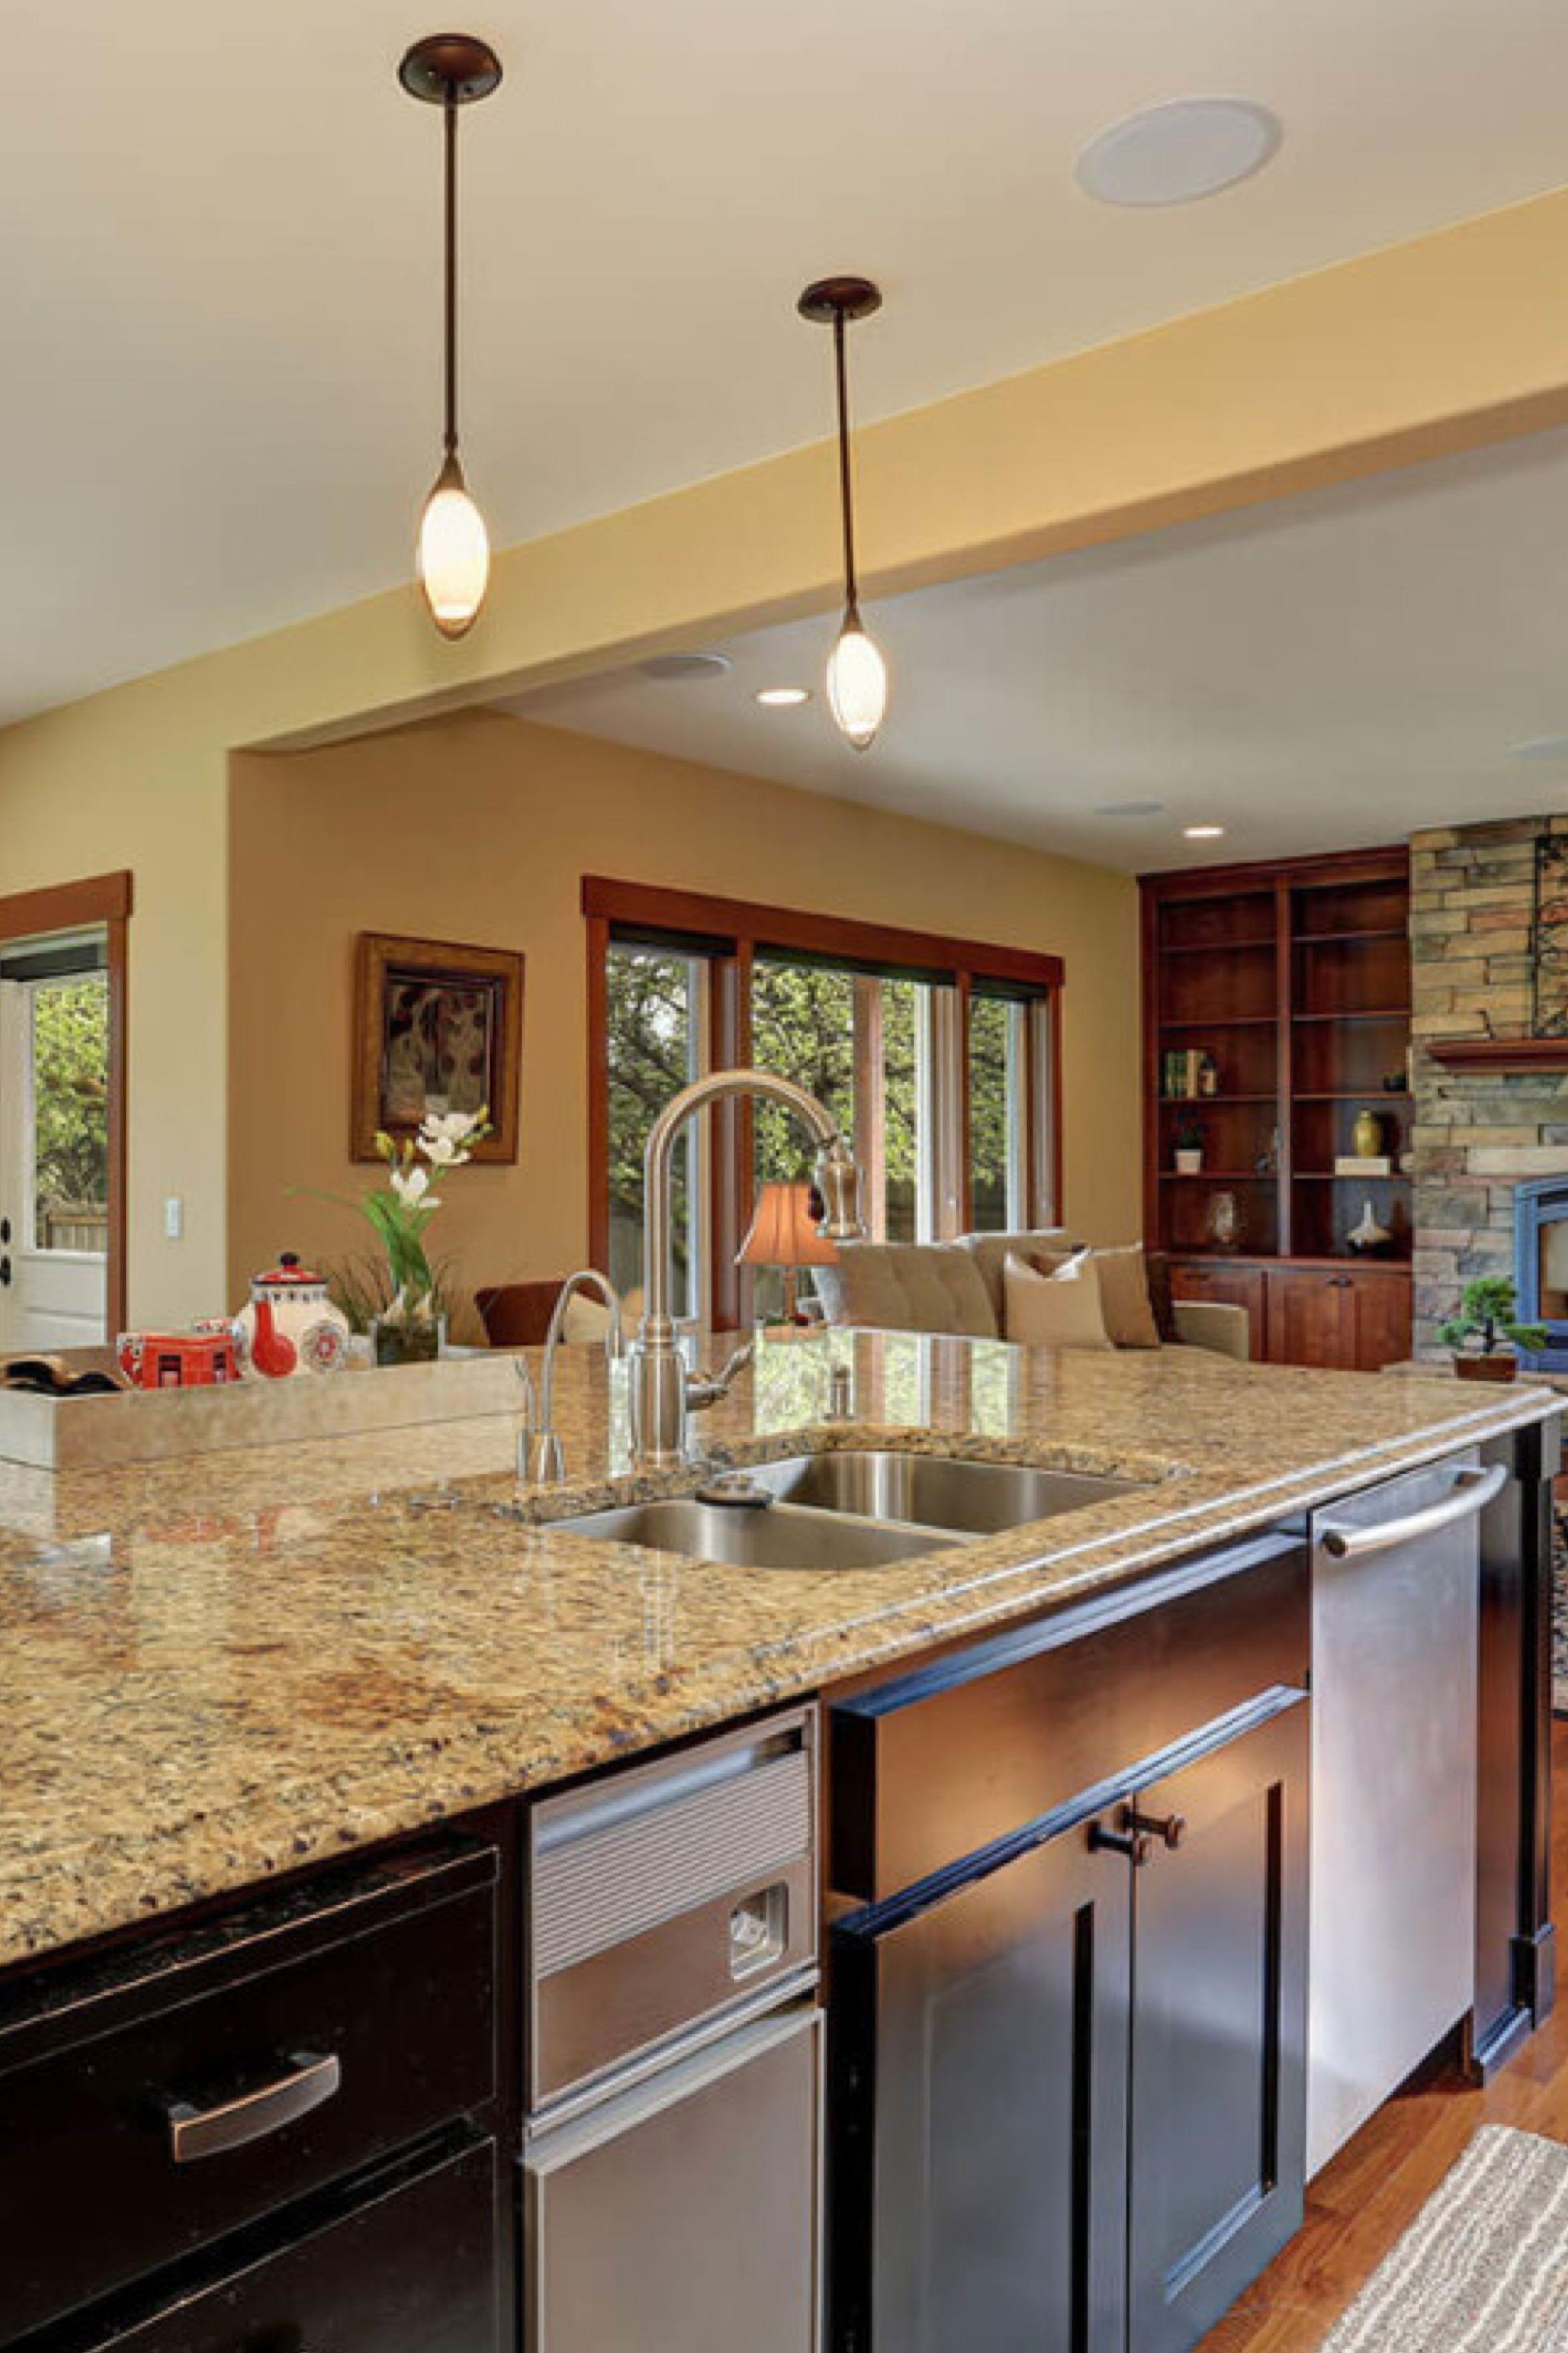 New Gold Granite Countertops, Cost, Reviews in